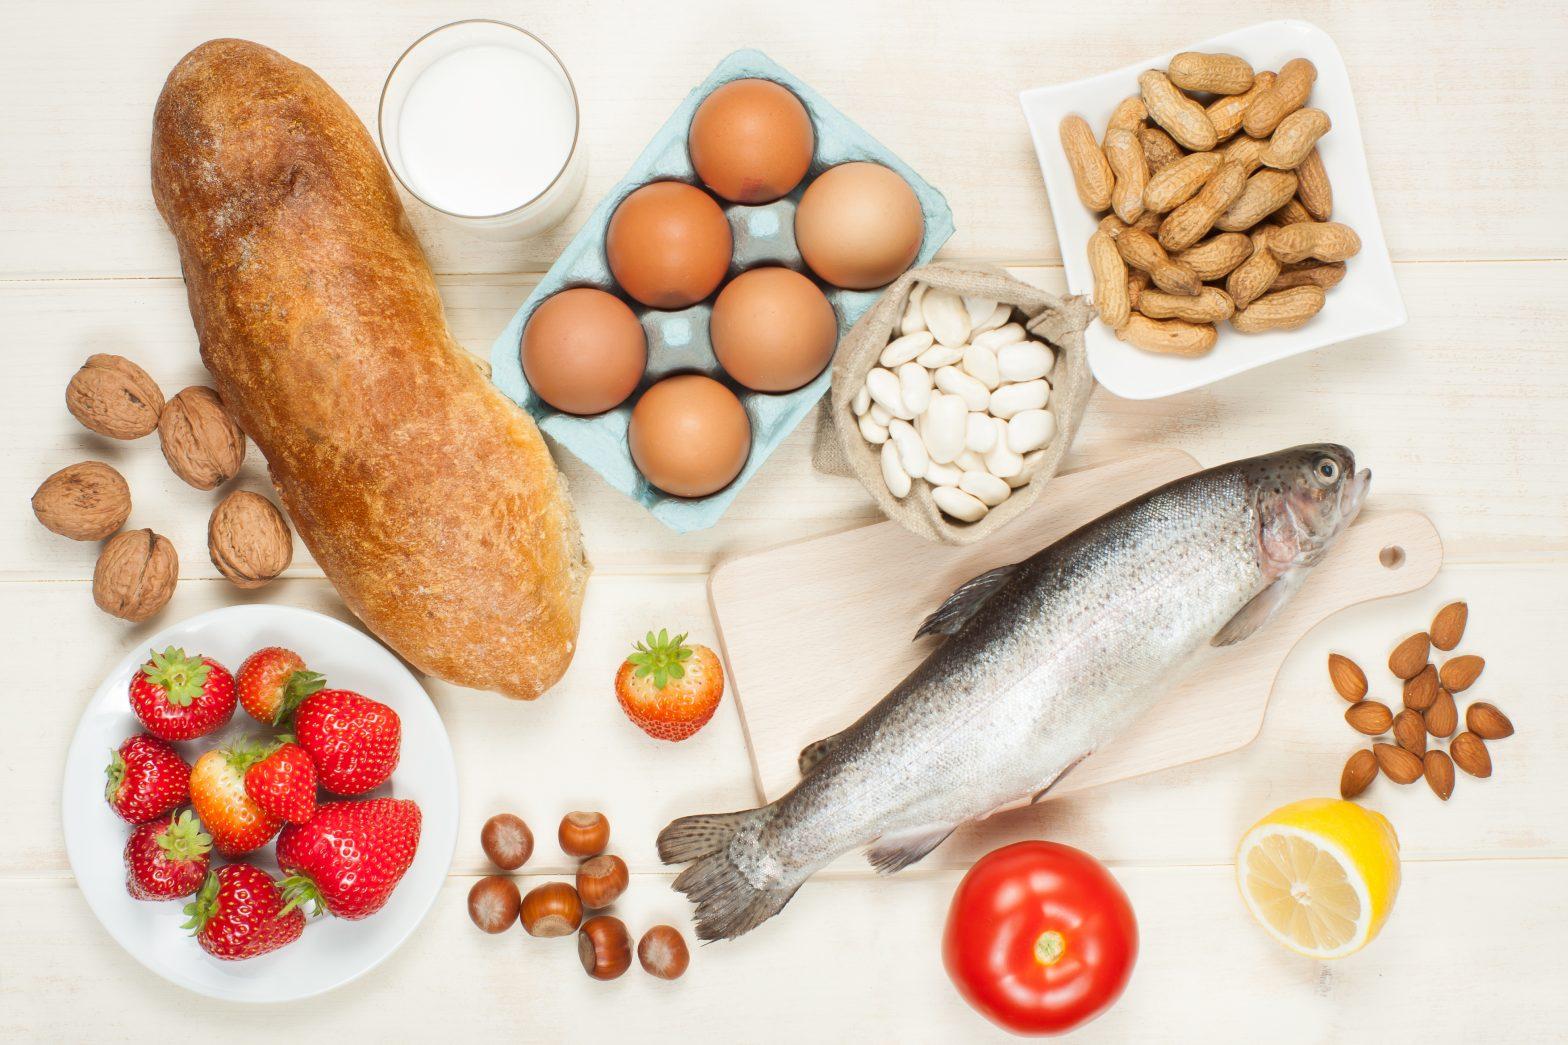 Potentiellt allergen mat